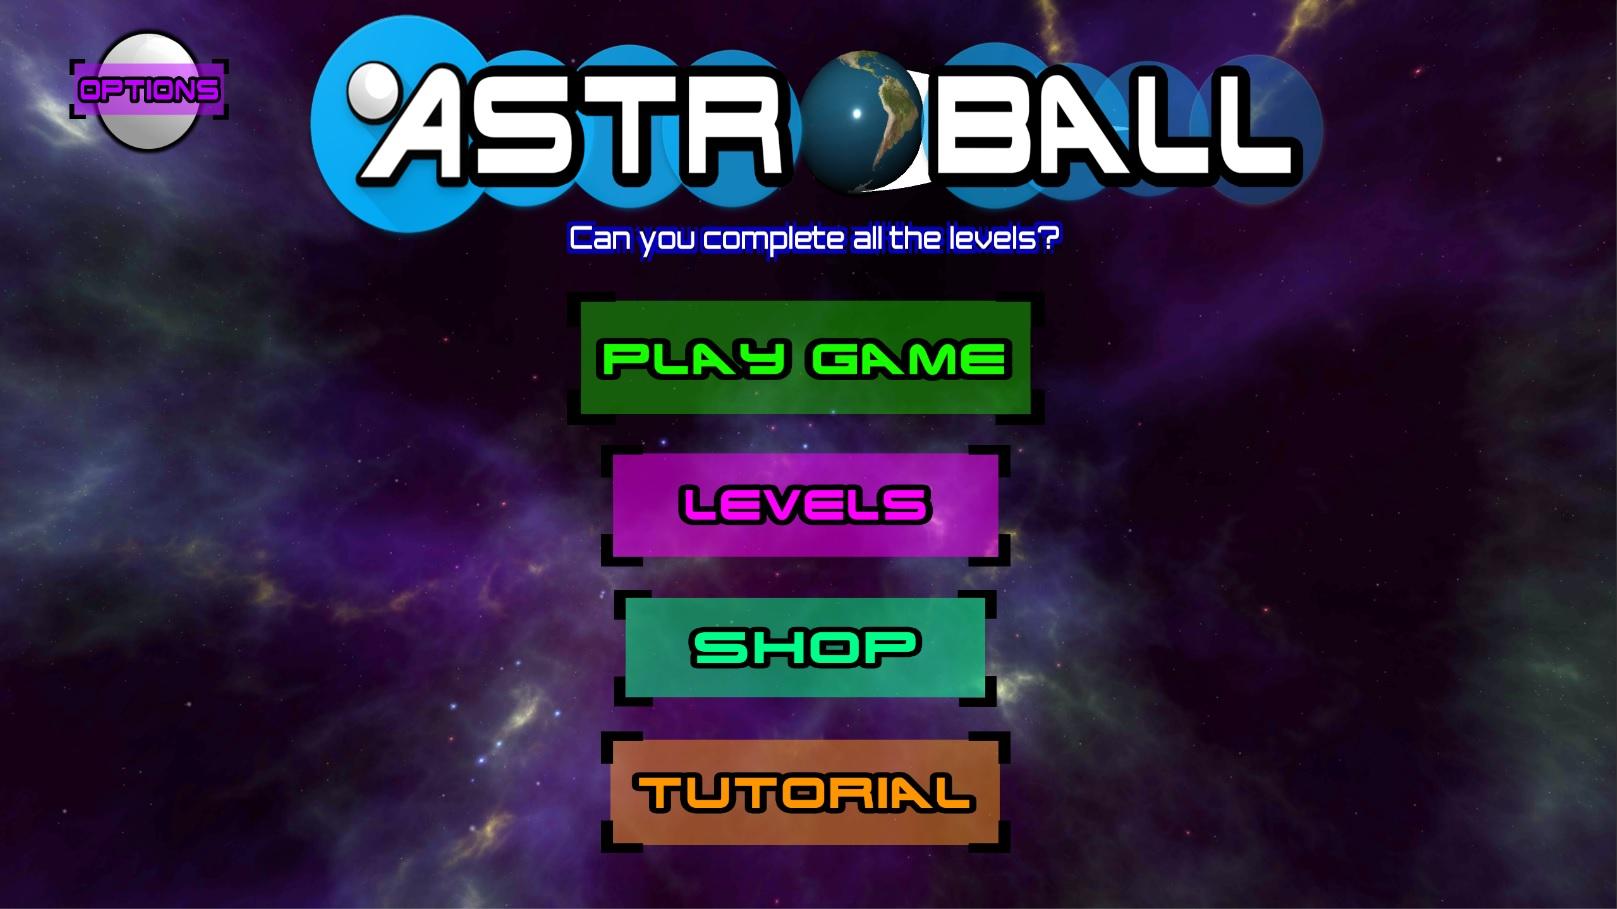 AstroBall